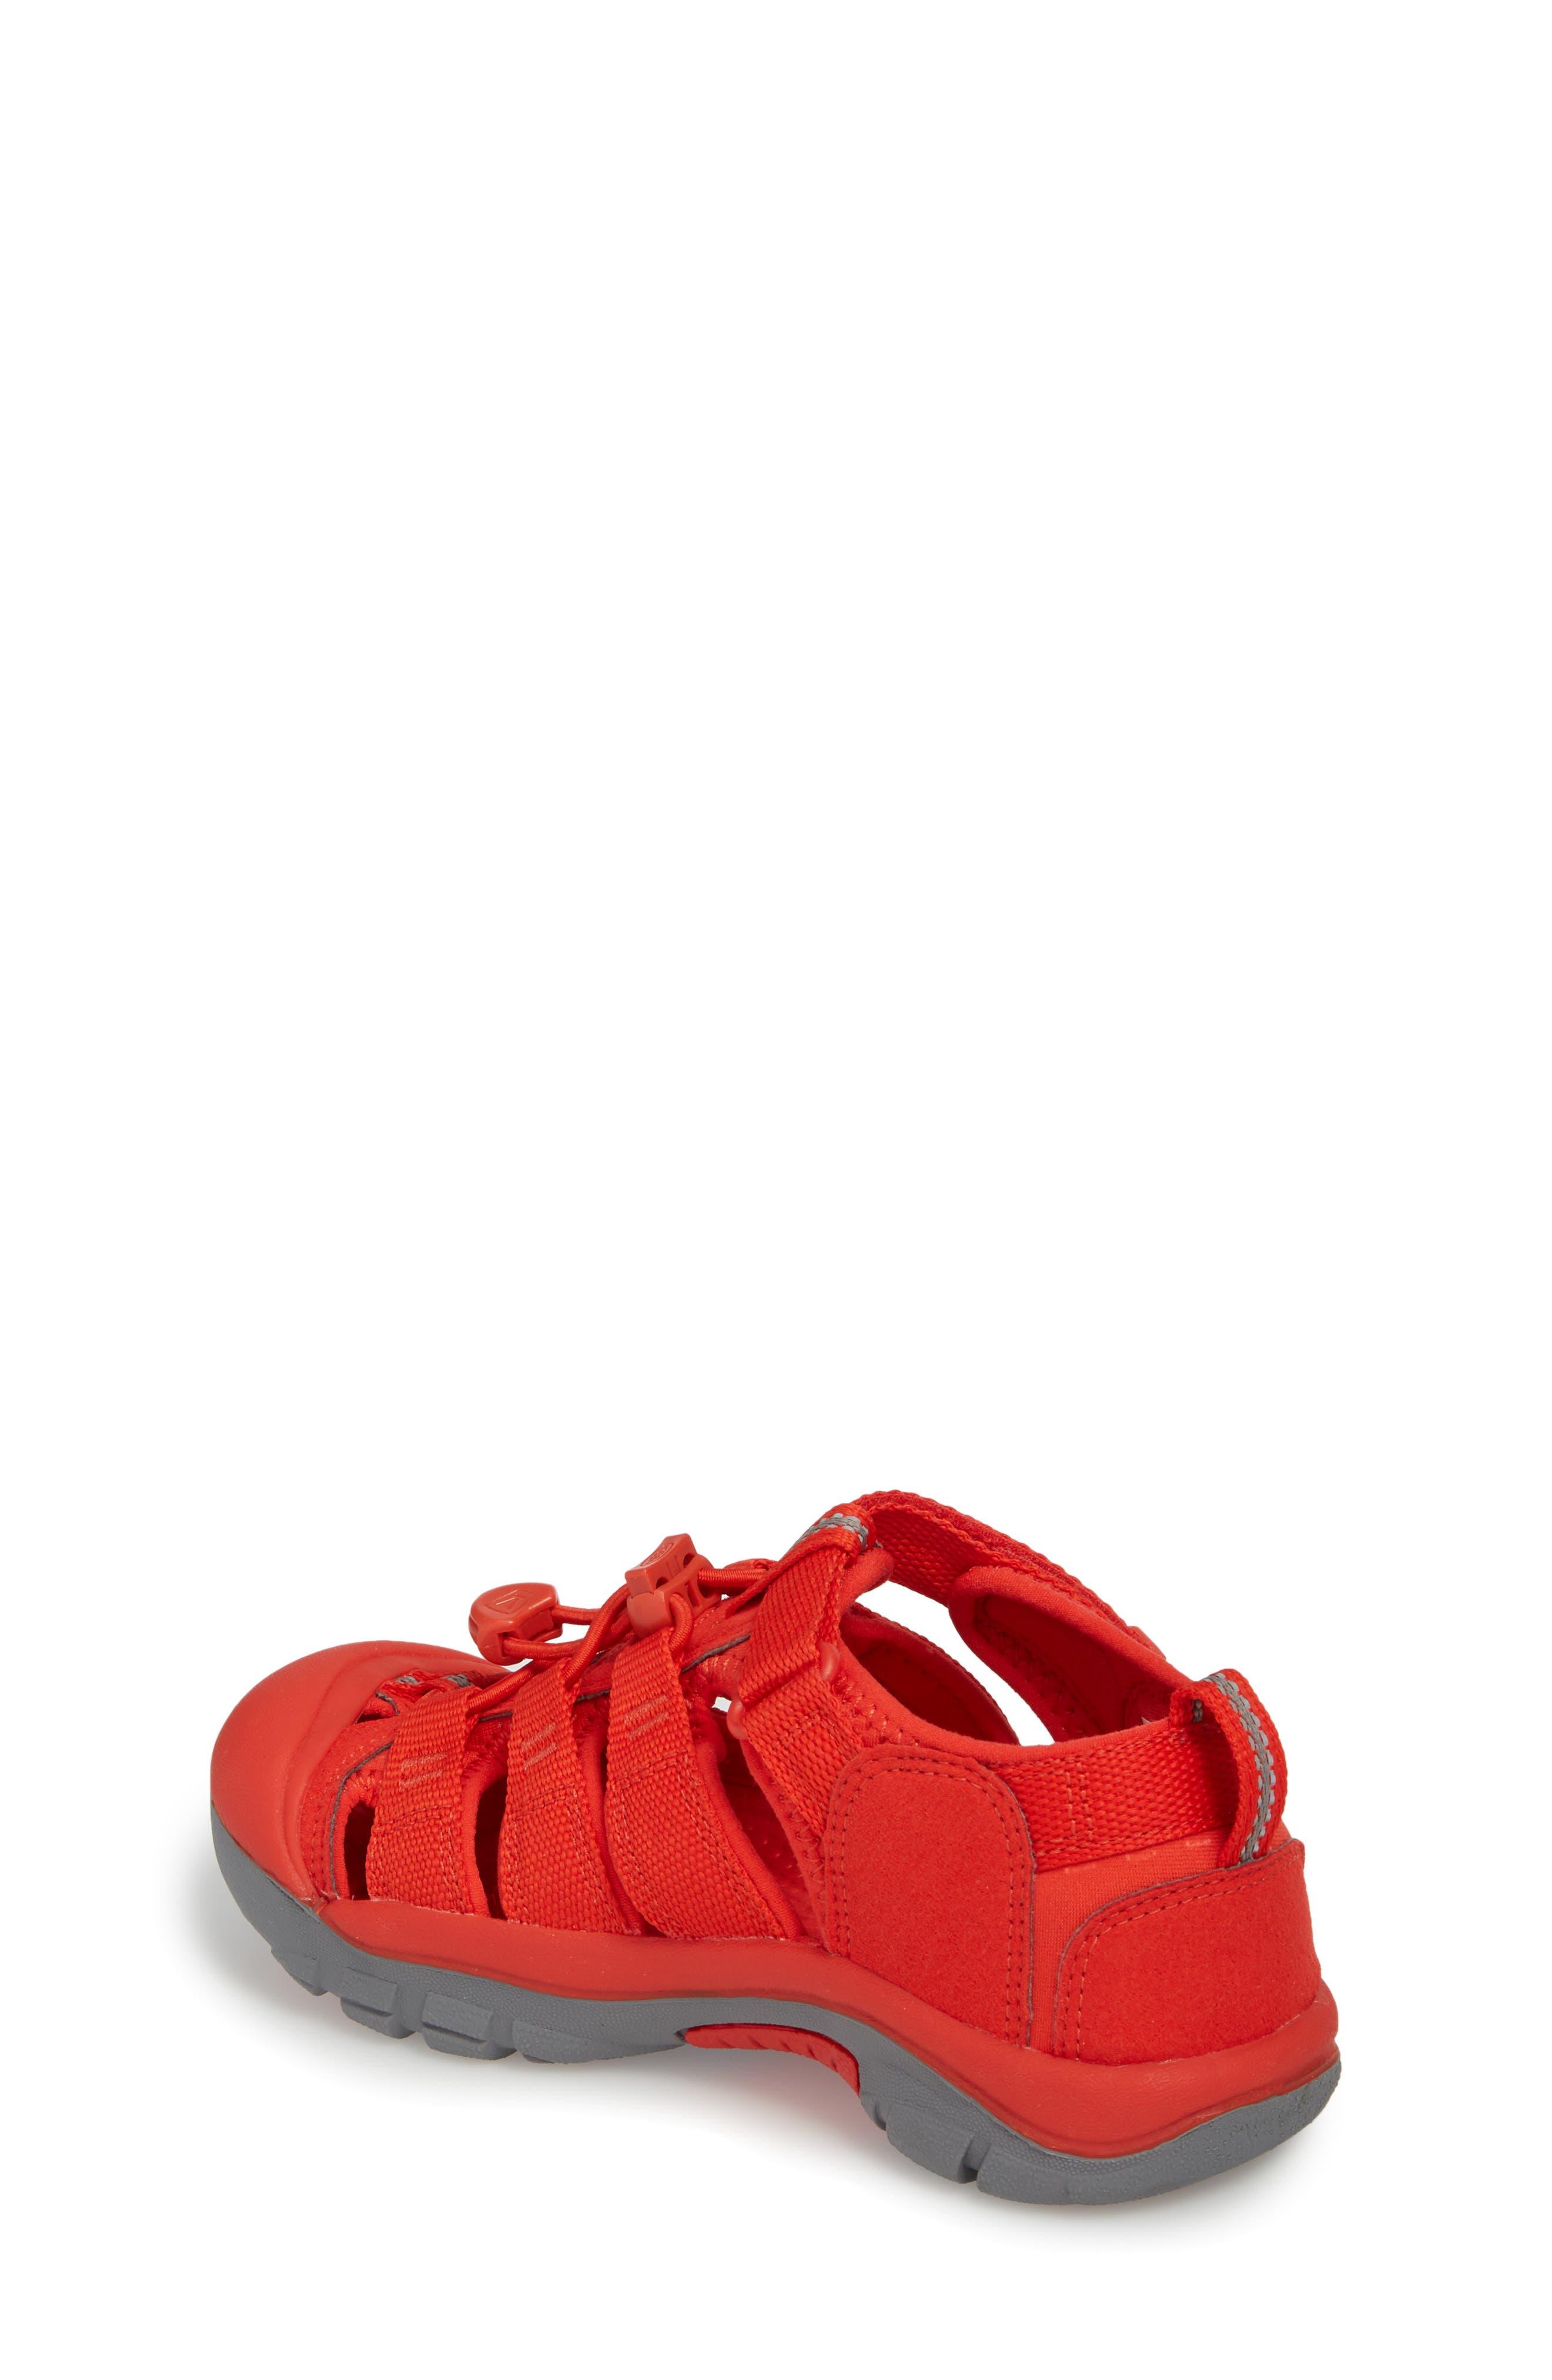 'Newport H2' Water Friendly Sandal,                             Alternate thumbnail 66, color,